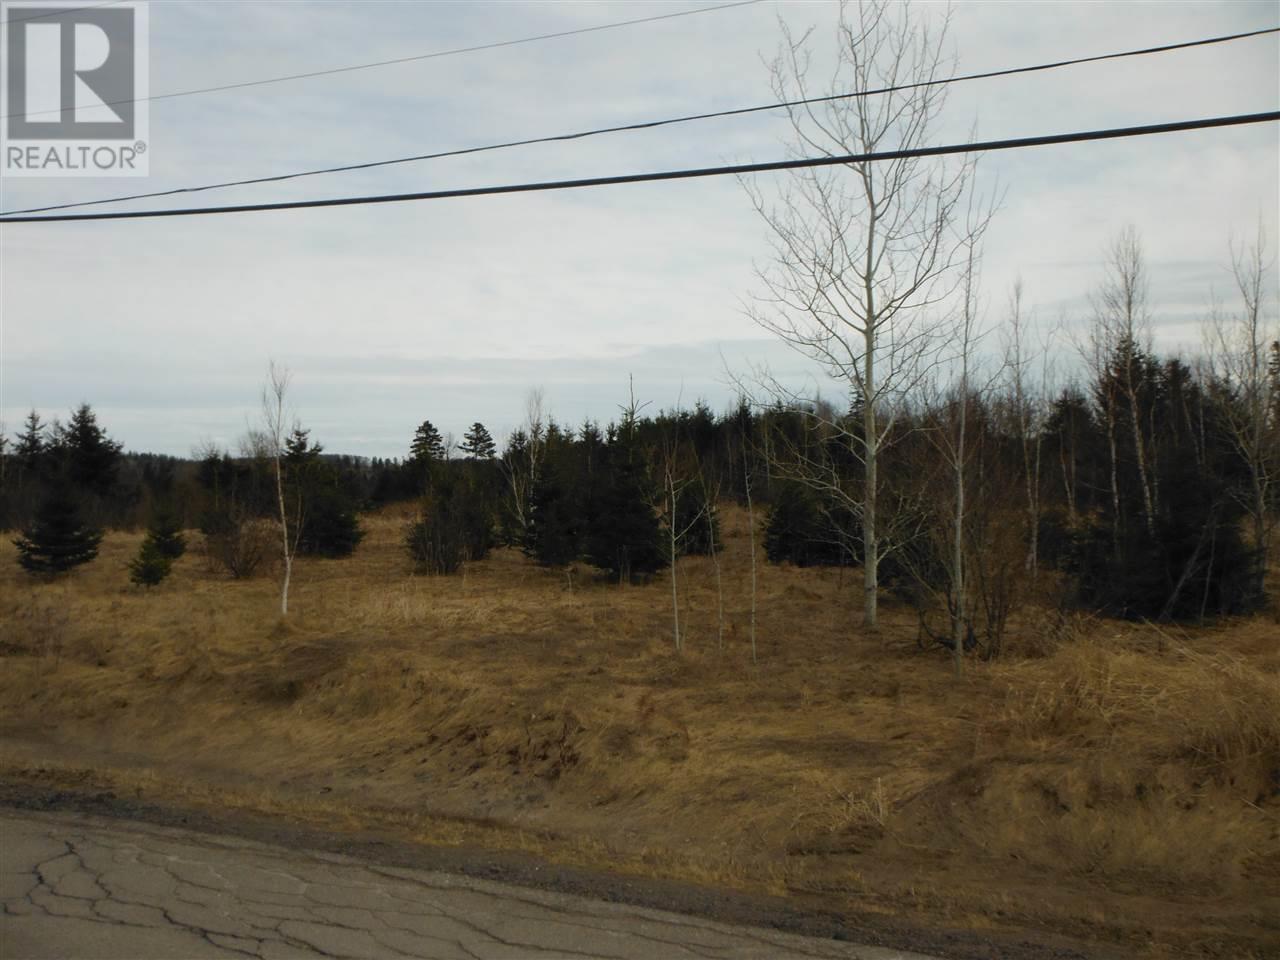 Lot 1-16 Royalty Junction Road, Charlottetown, Prince Edward Island  C1E 1Z2 - Photo 3 - 202006111